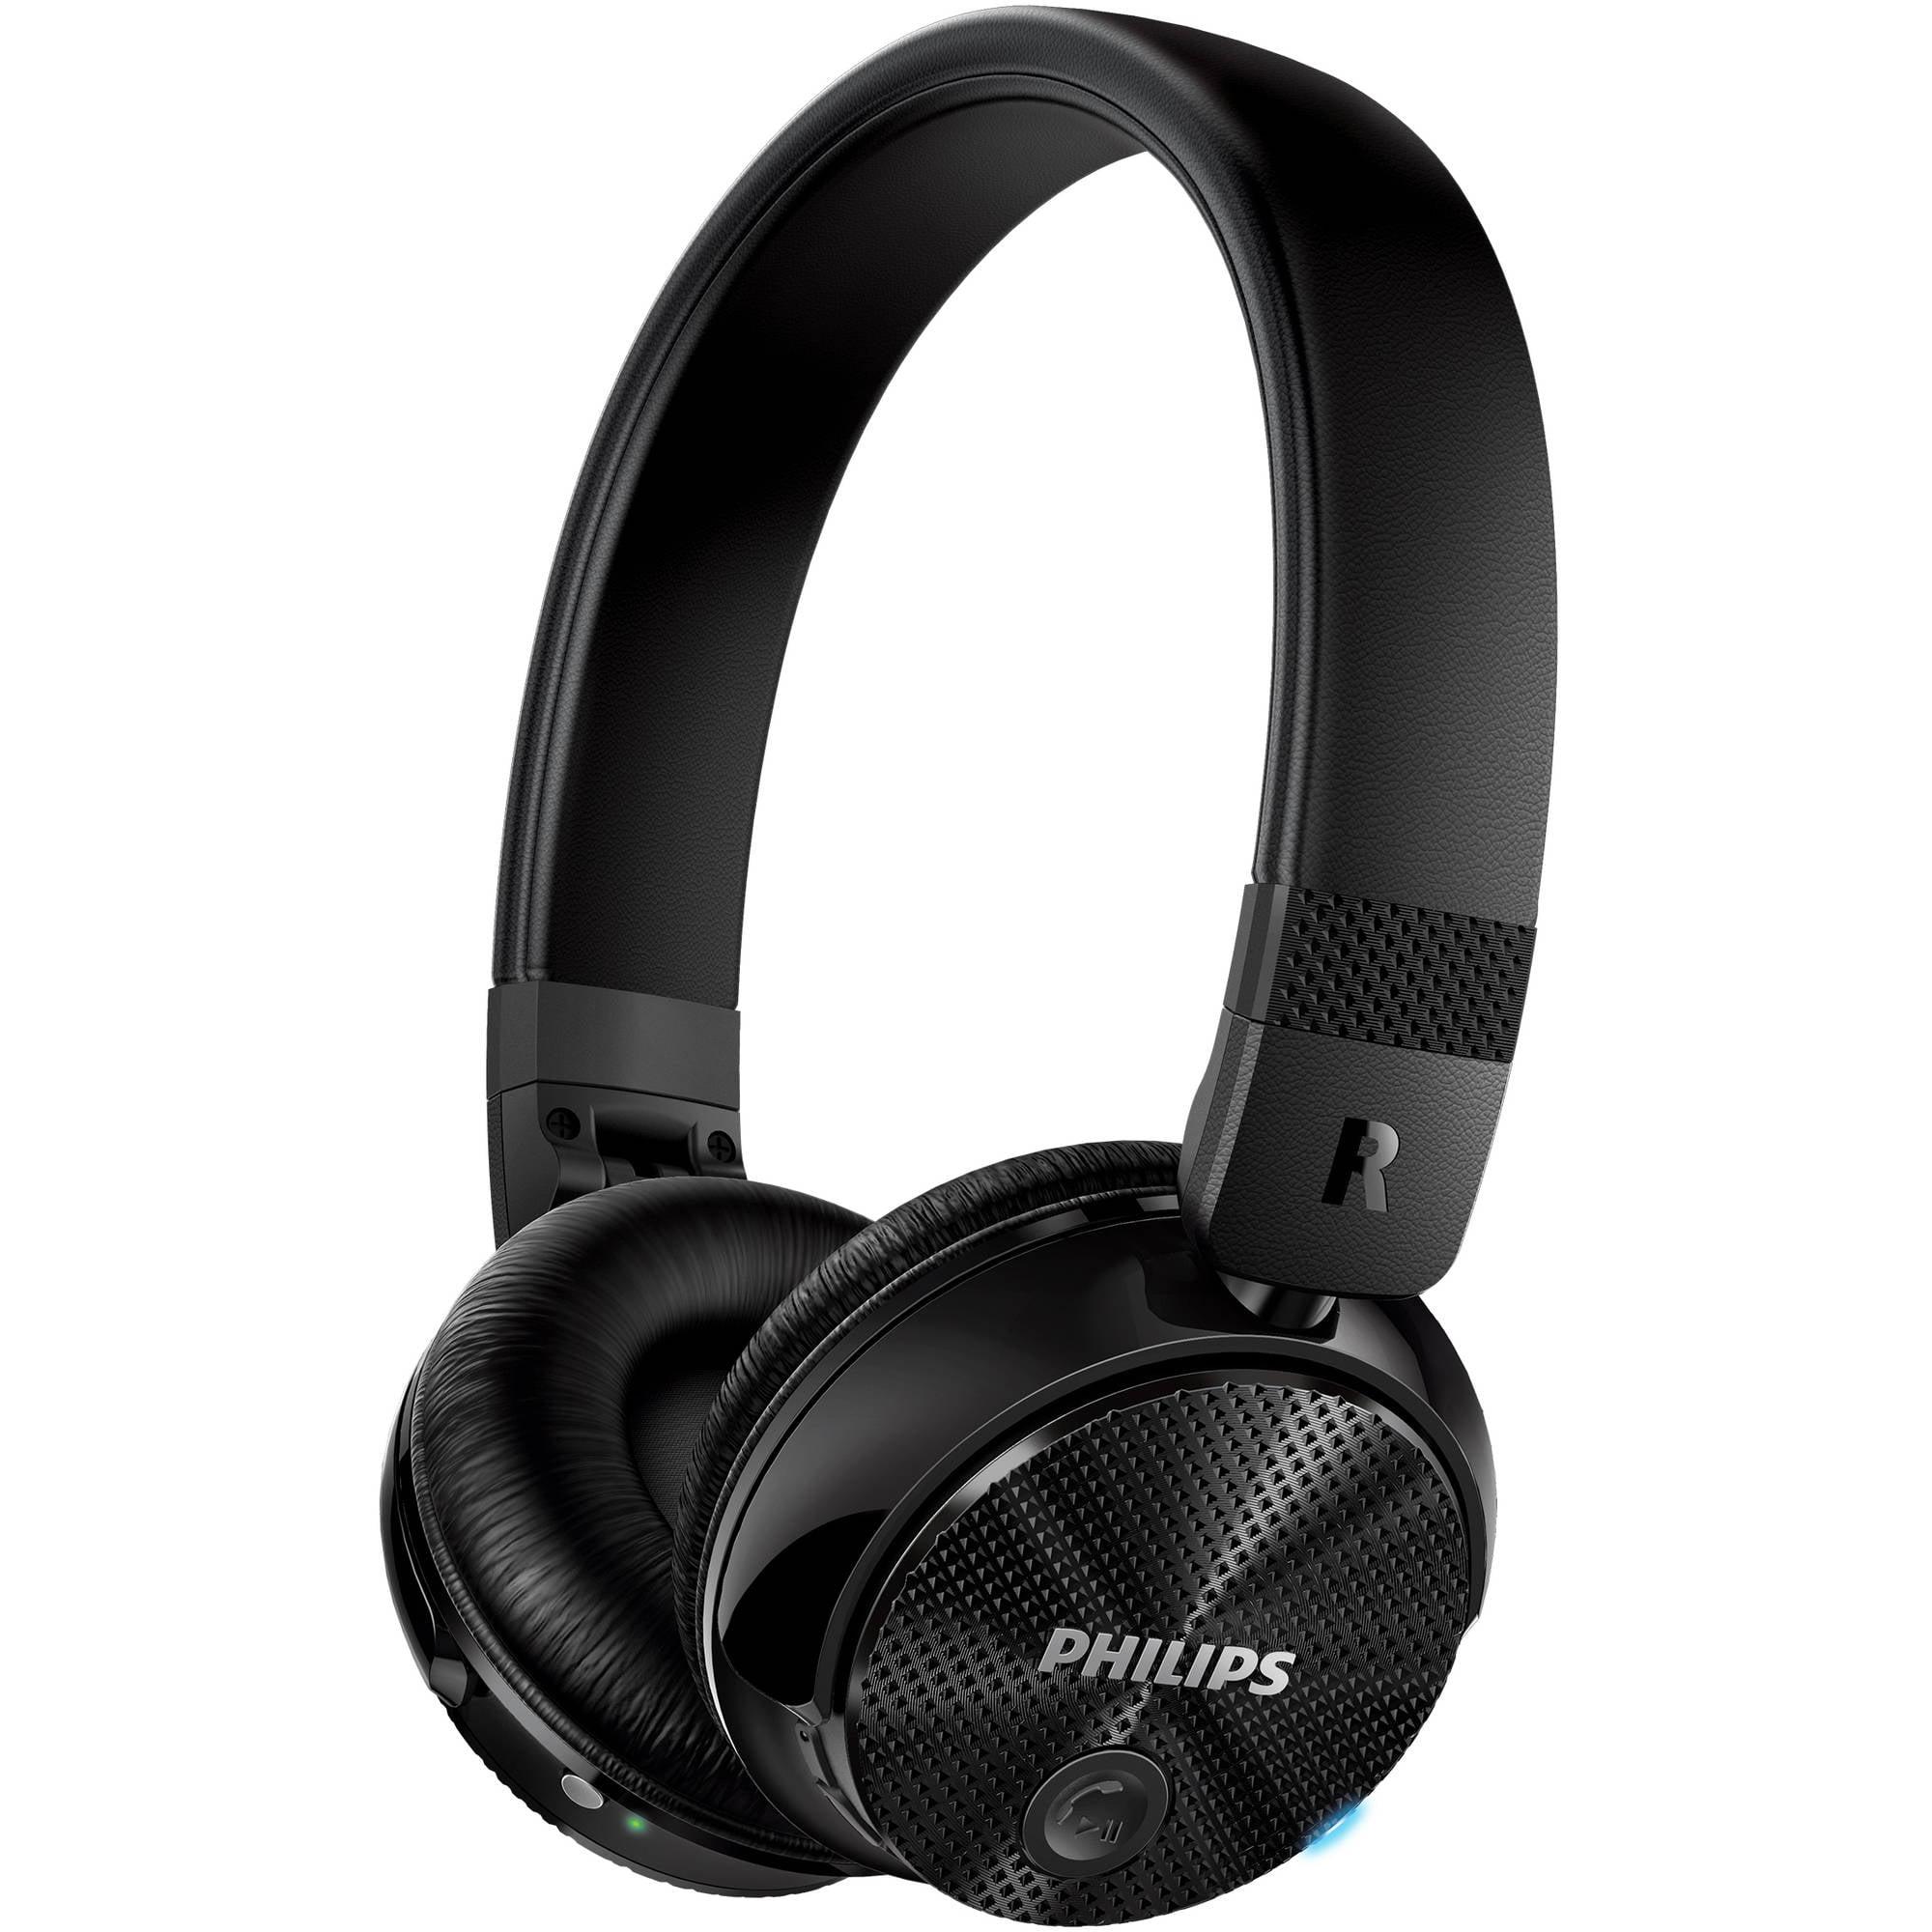 Philips SHB8750NC Bluetooth Noise-Canceling Headphones